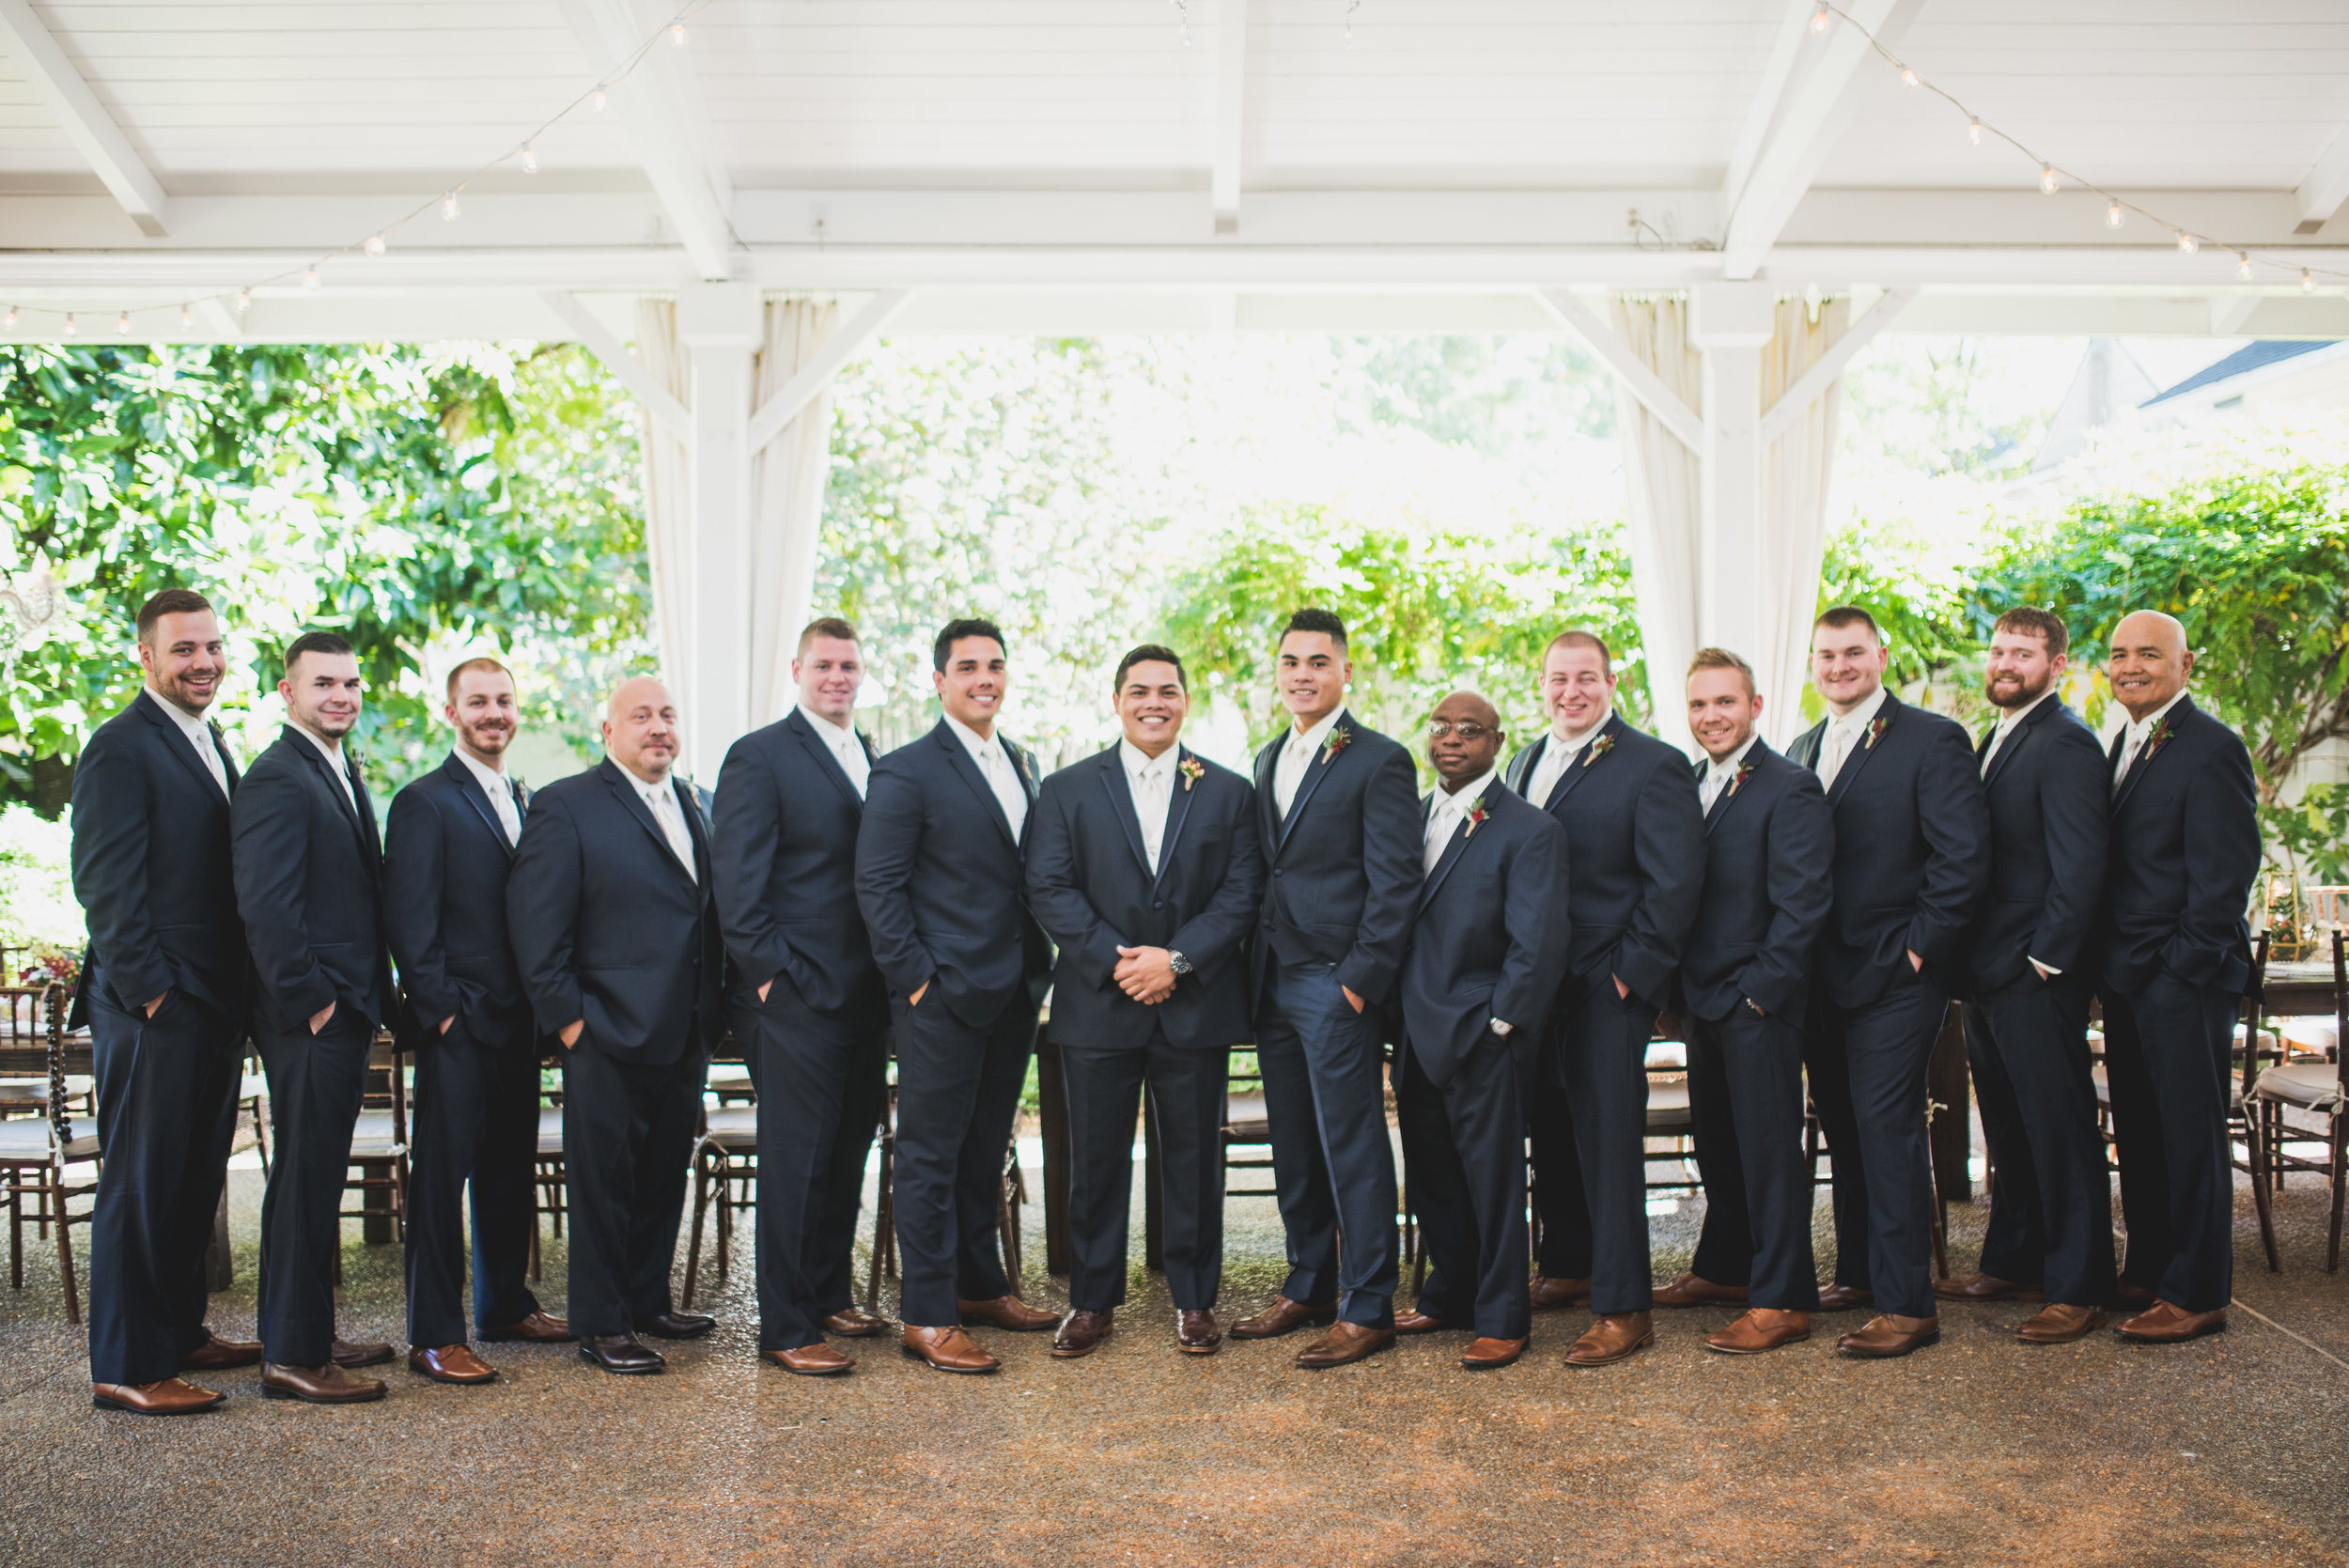 Nashville-wedding-photographers-CJ's-Off-The-Square-17.JPG